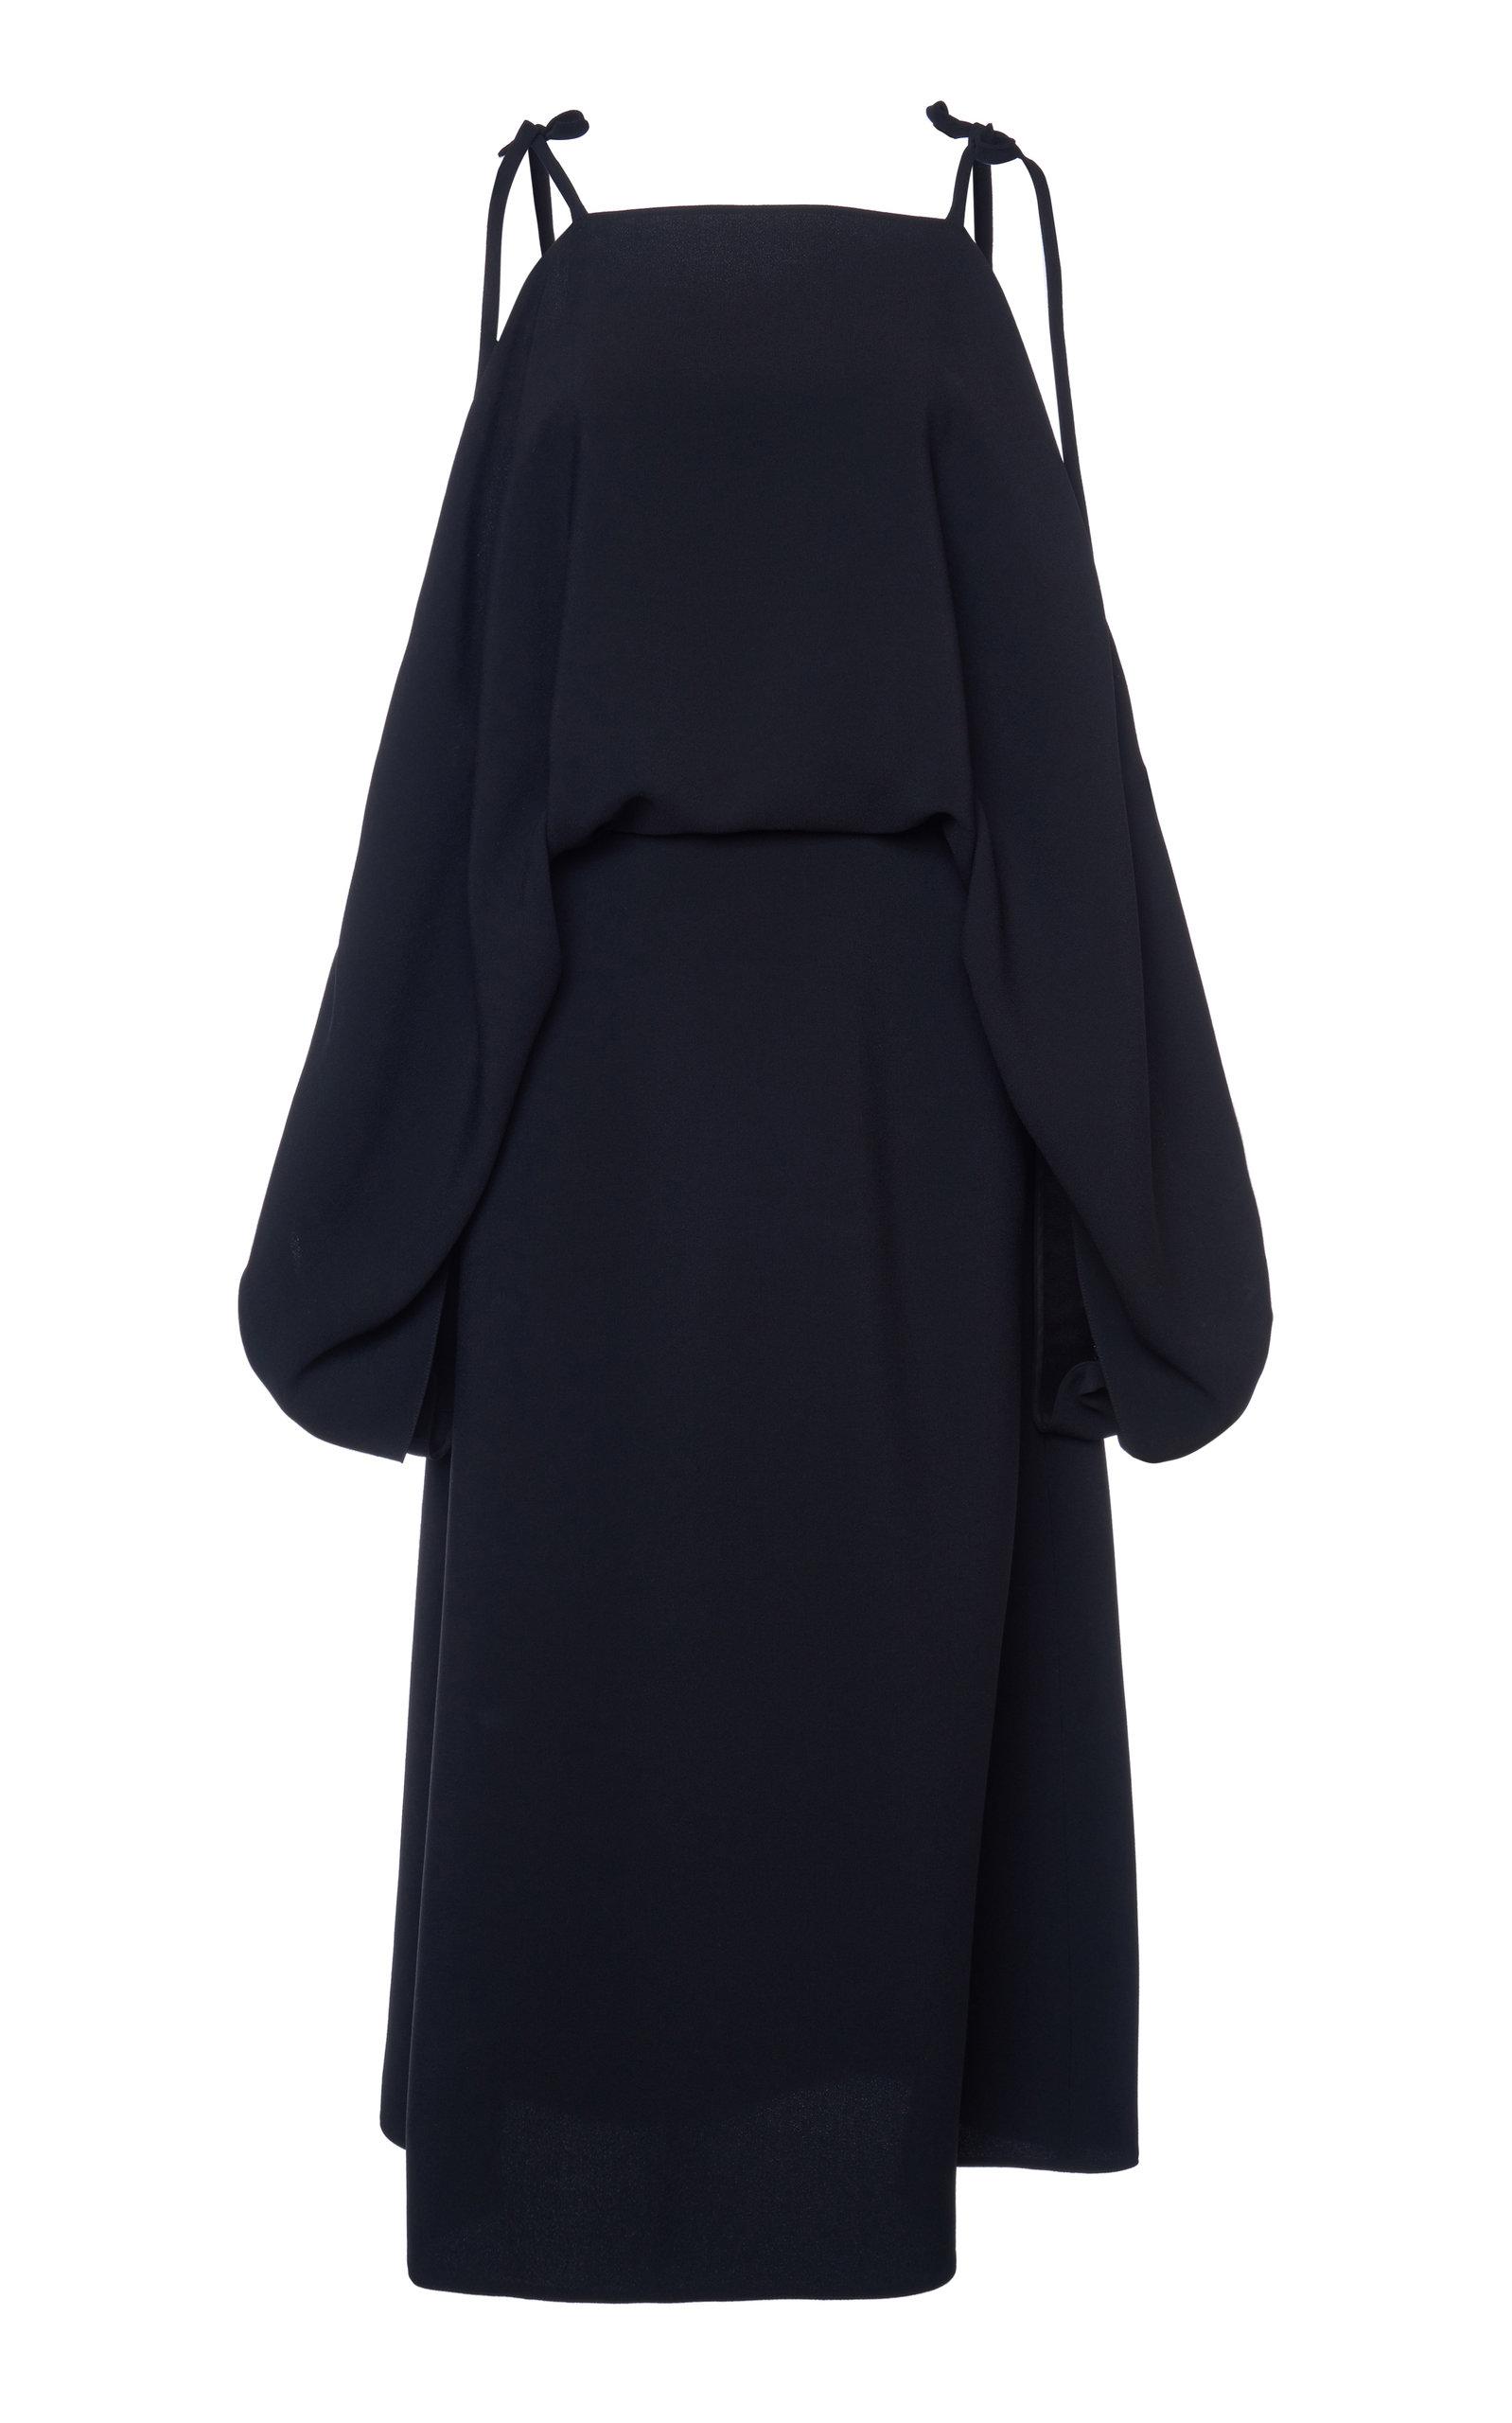 Buy Prada Cold Shoulder Tie Detail Midi Dress online, shop Prada at the best price